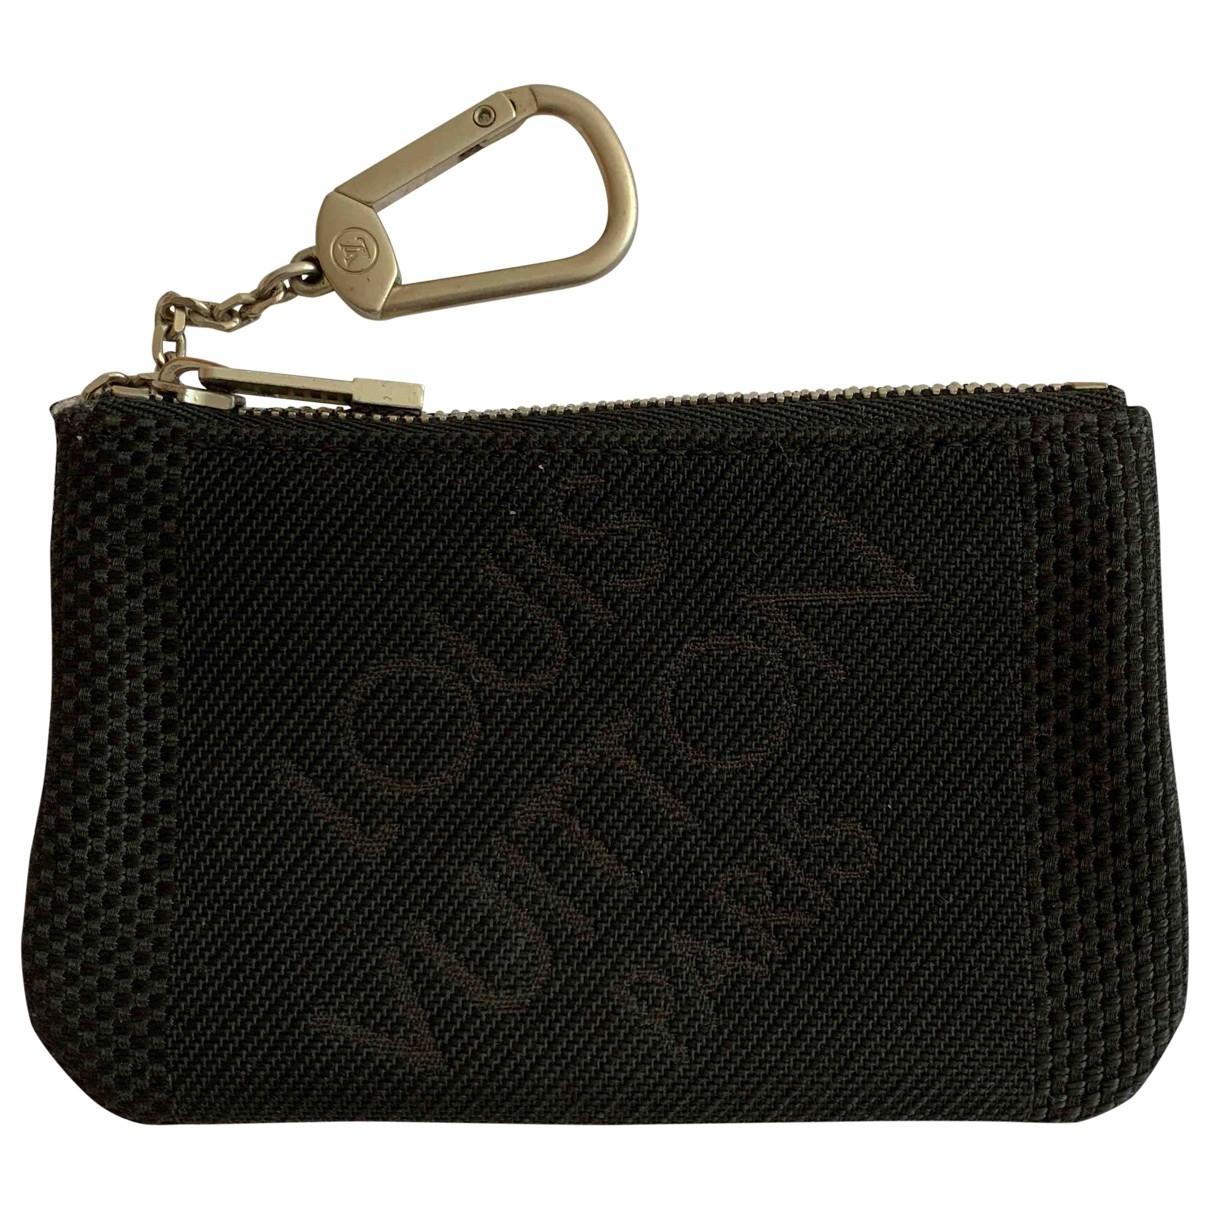 Louis Vuitton Key Pouch Black Cloth Small bag, wallet & cases for Men \N